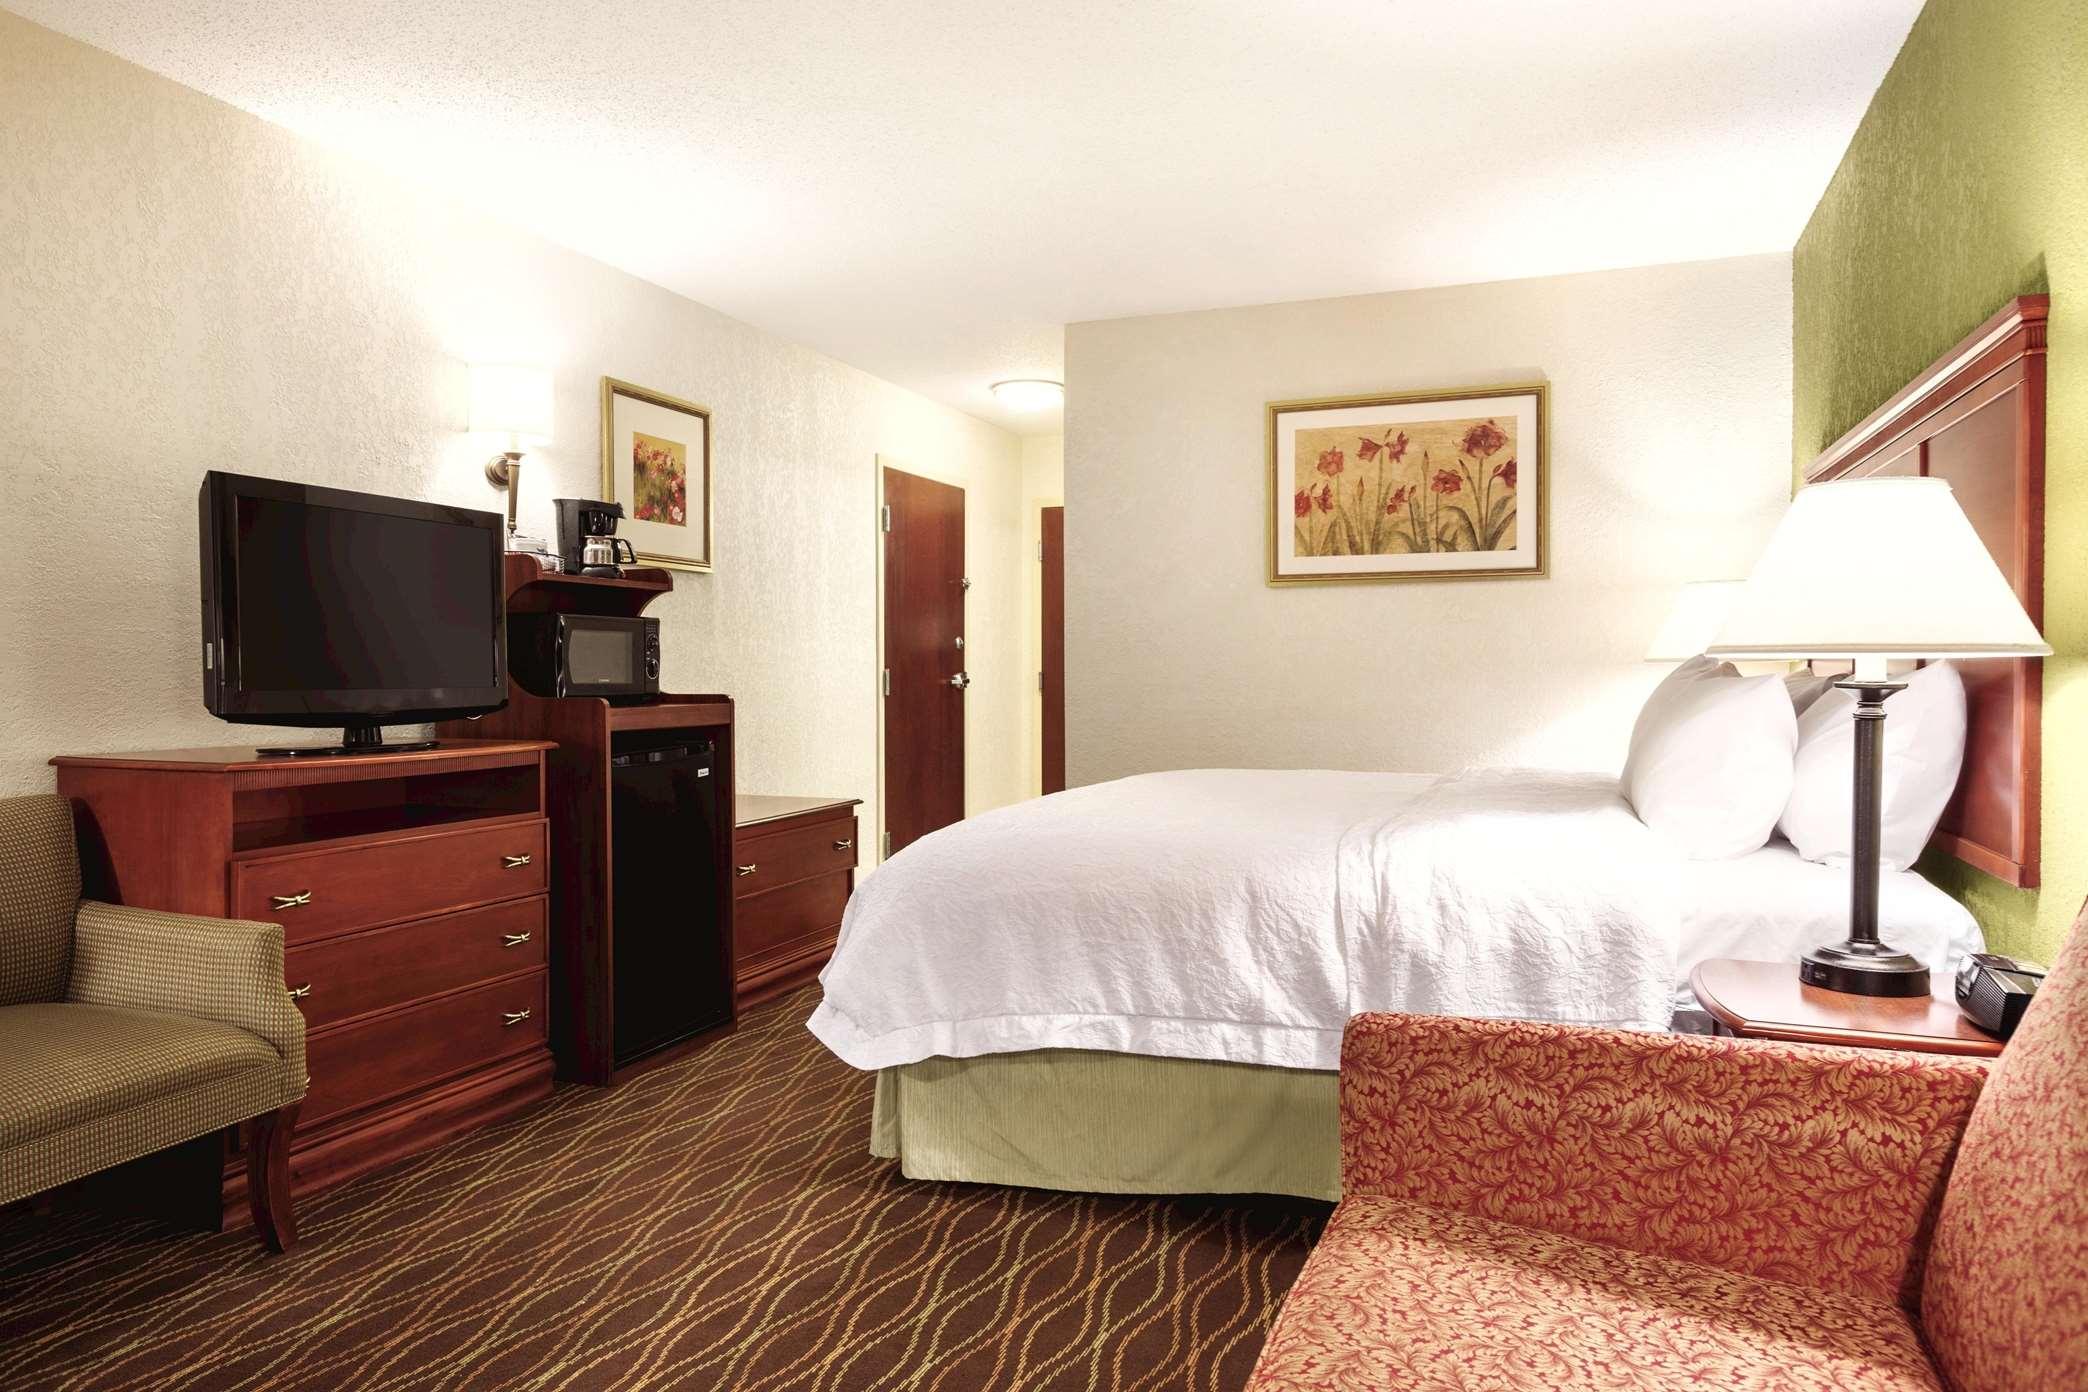 Hampton Inn & Suites Greenfield image 32